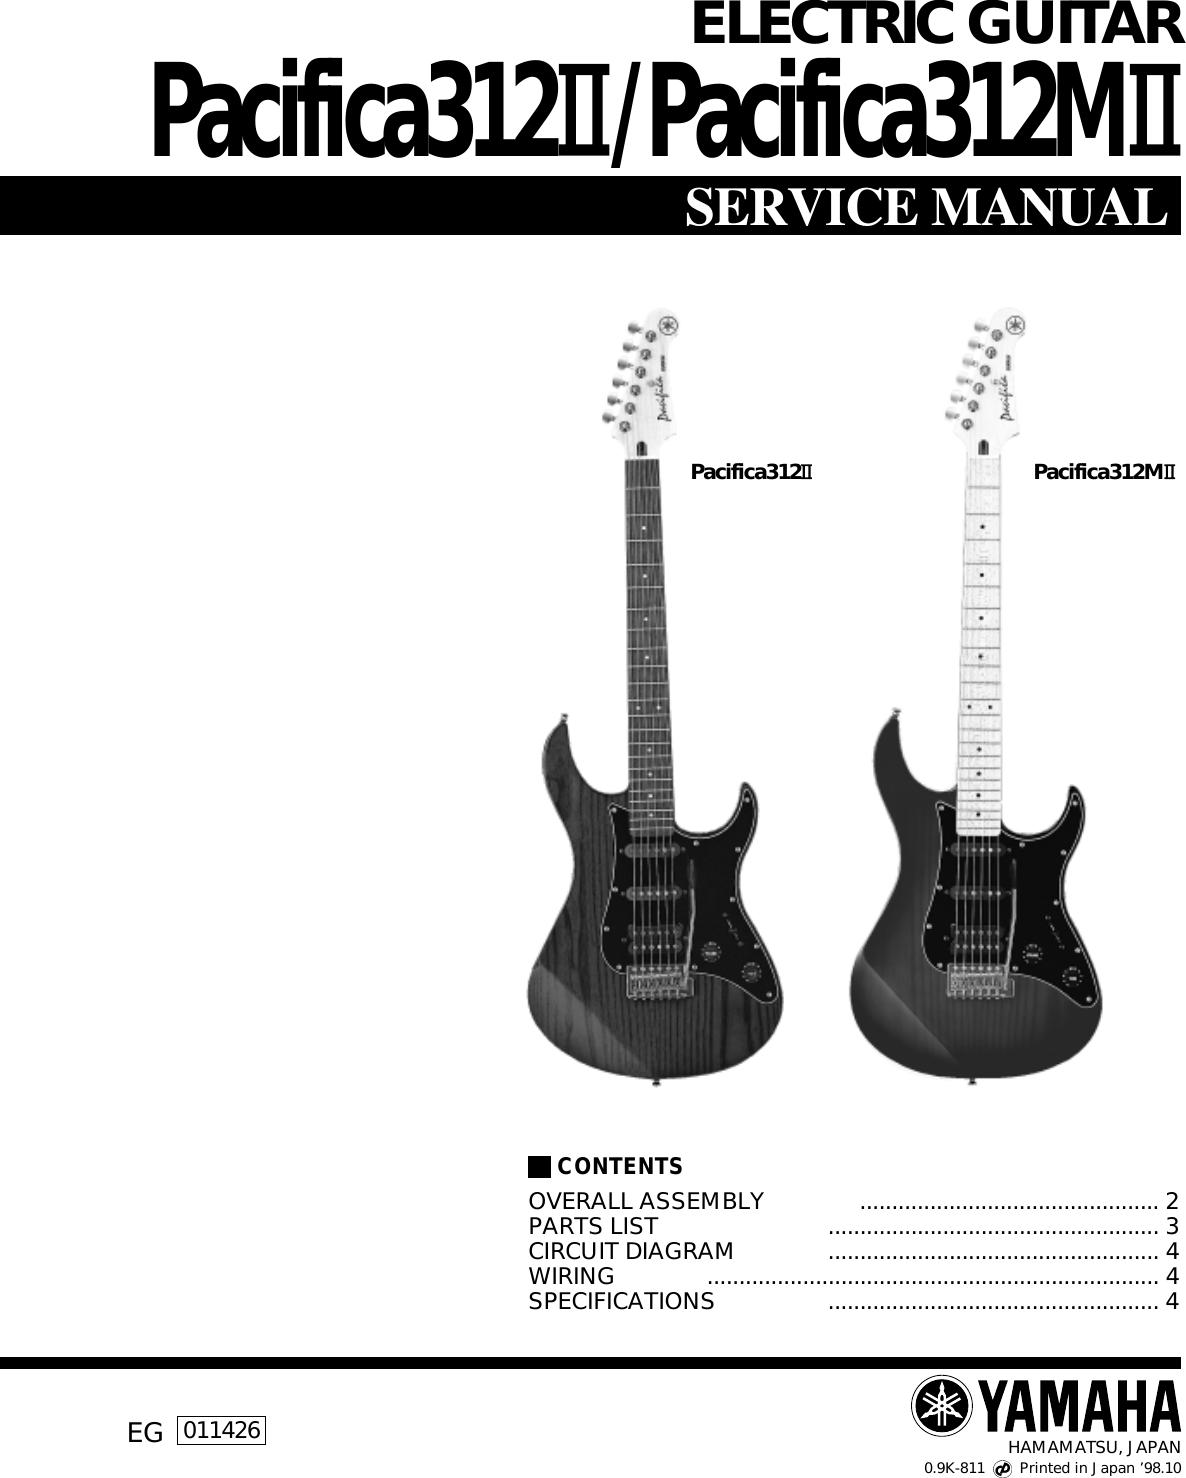 Basic Guitar Electronics Manual Guide